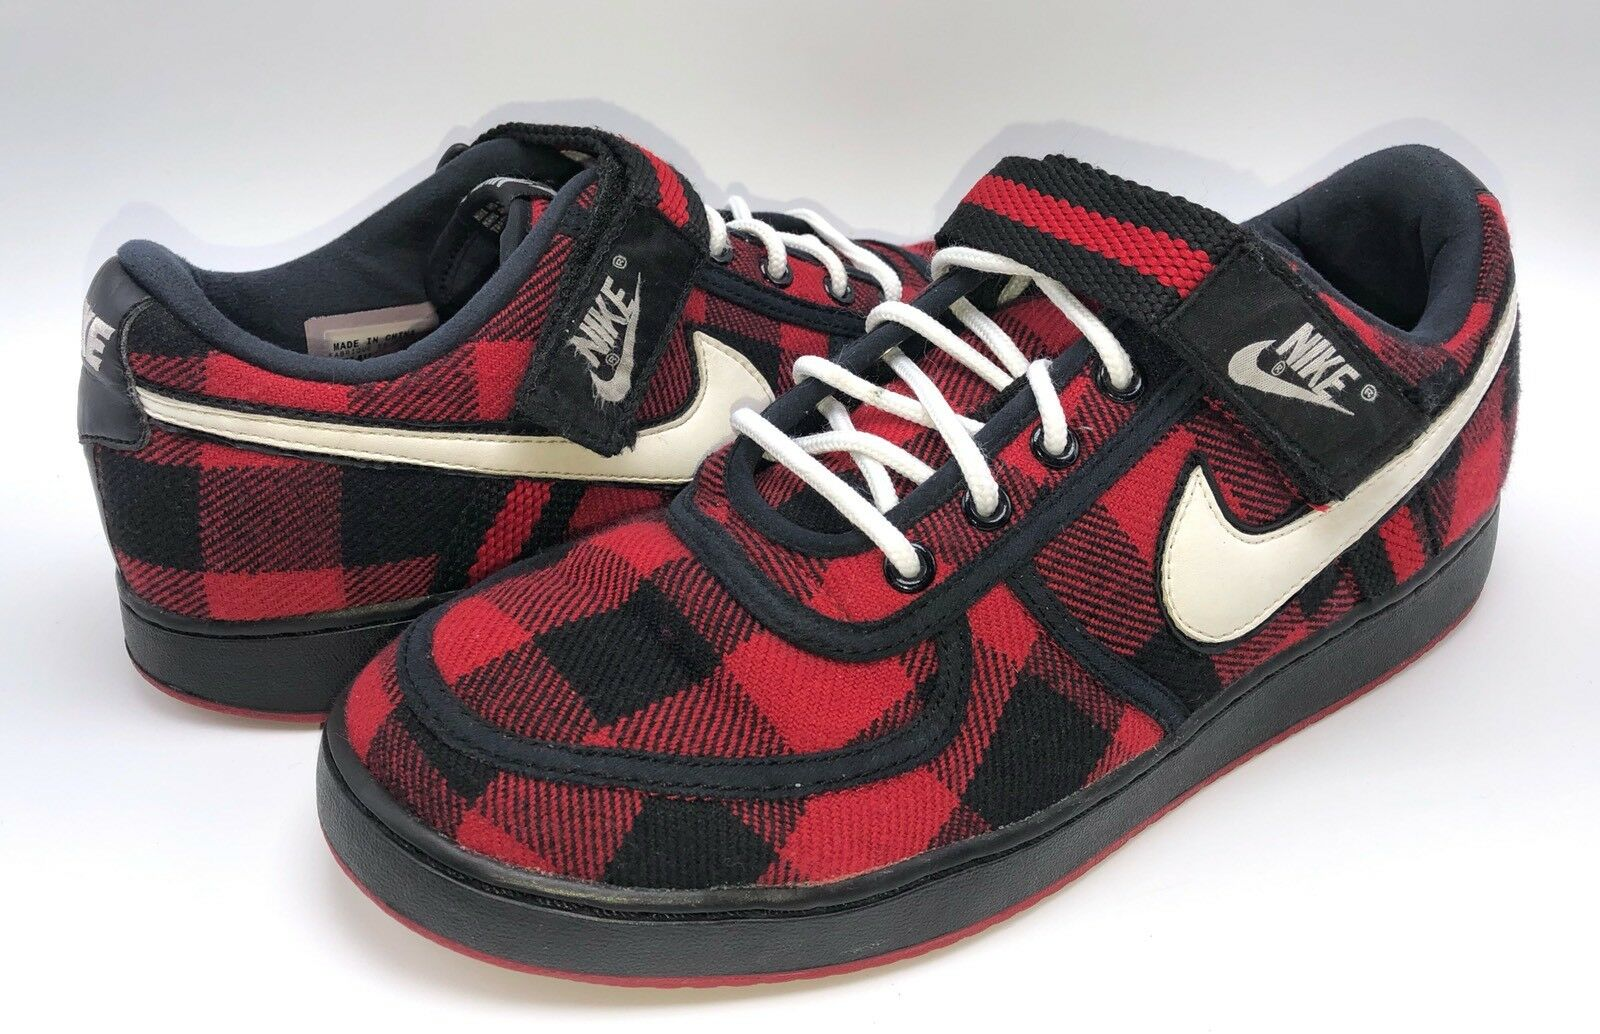 Nike Vandal Low Premium Flanel Red Black Lumberjack Men's Size 10.5 341537-611